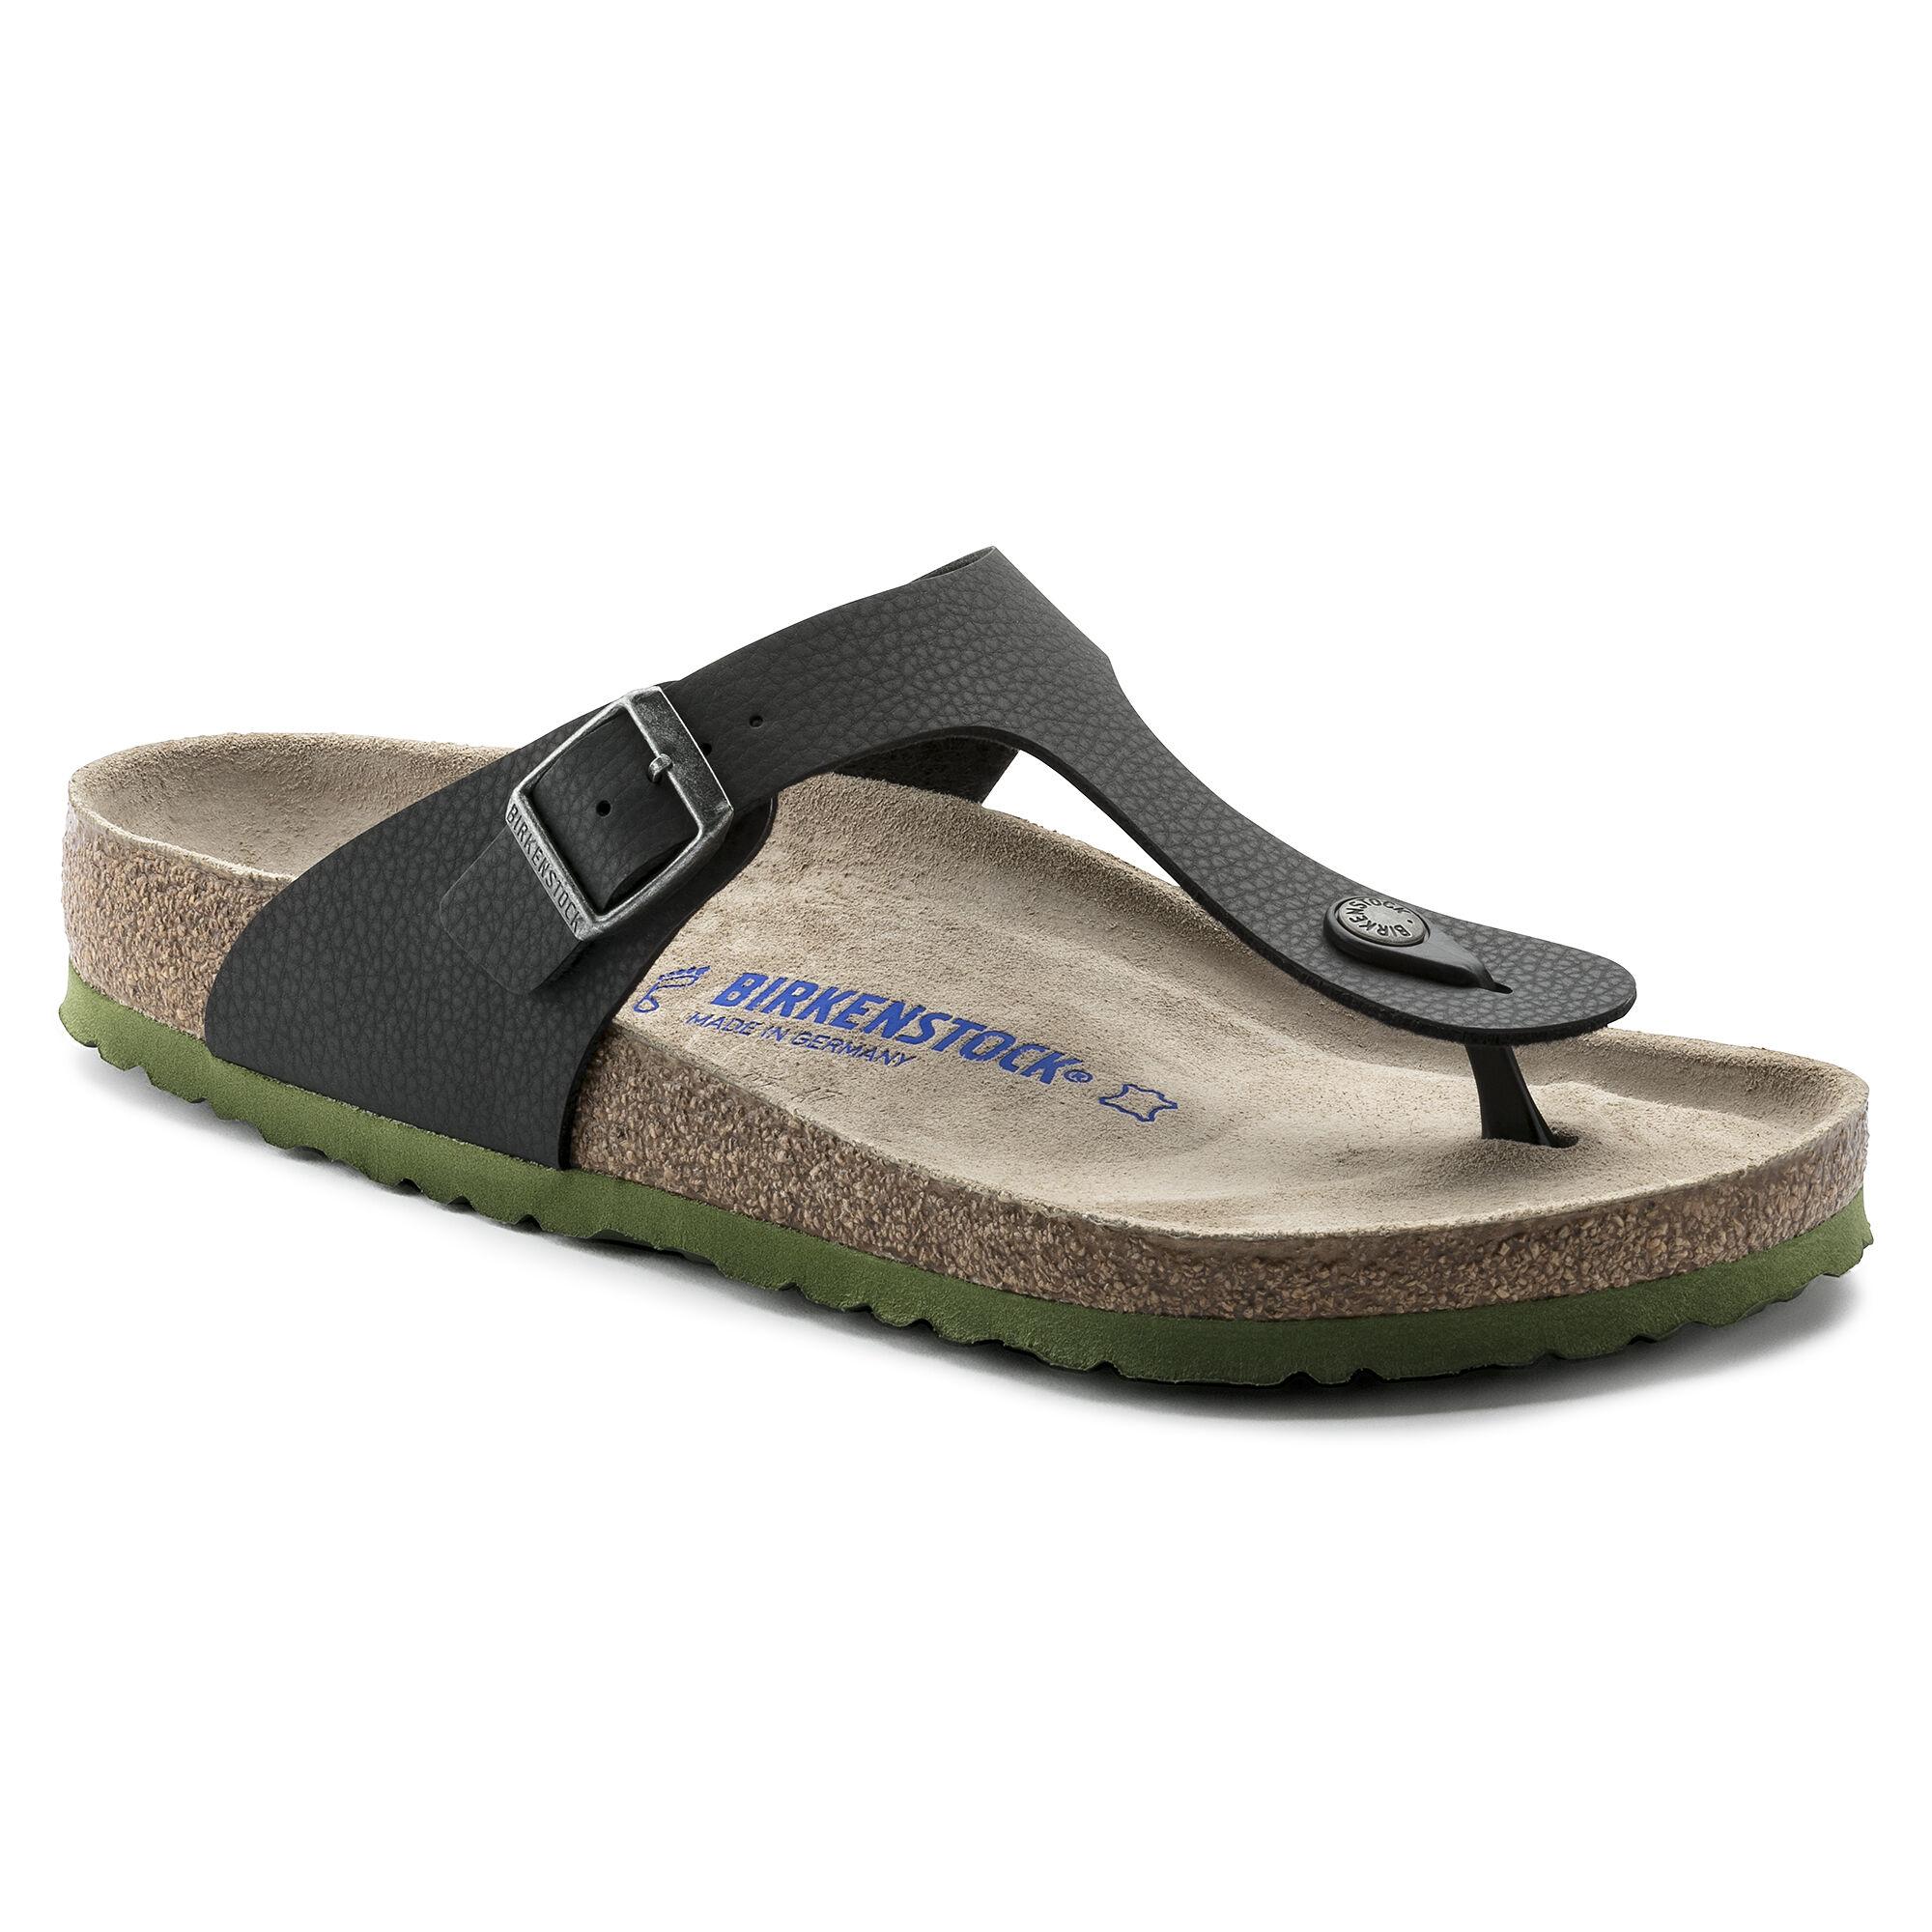 Birkenstock GIZEH - T-bar sandals - desert soil/green ptff4